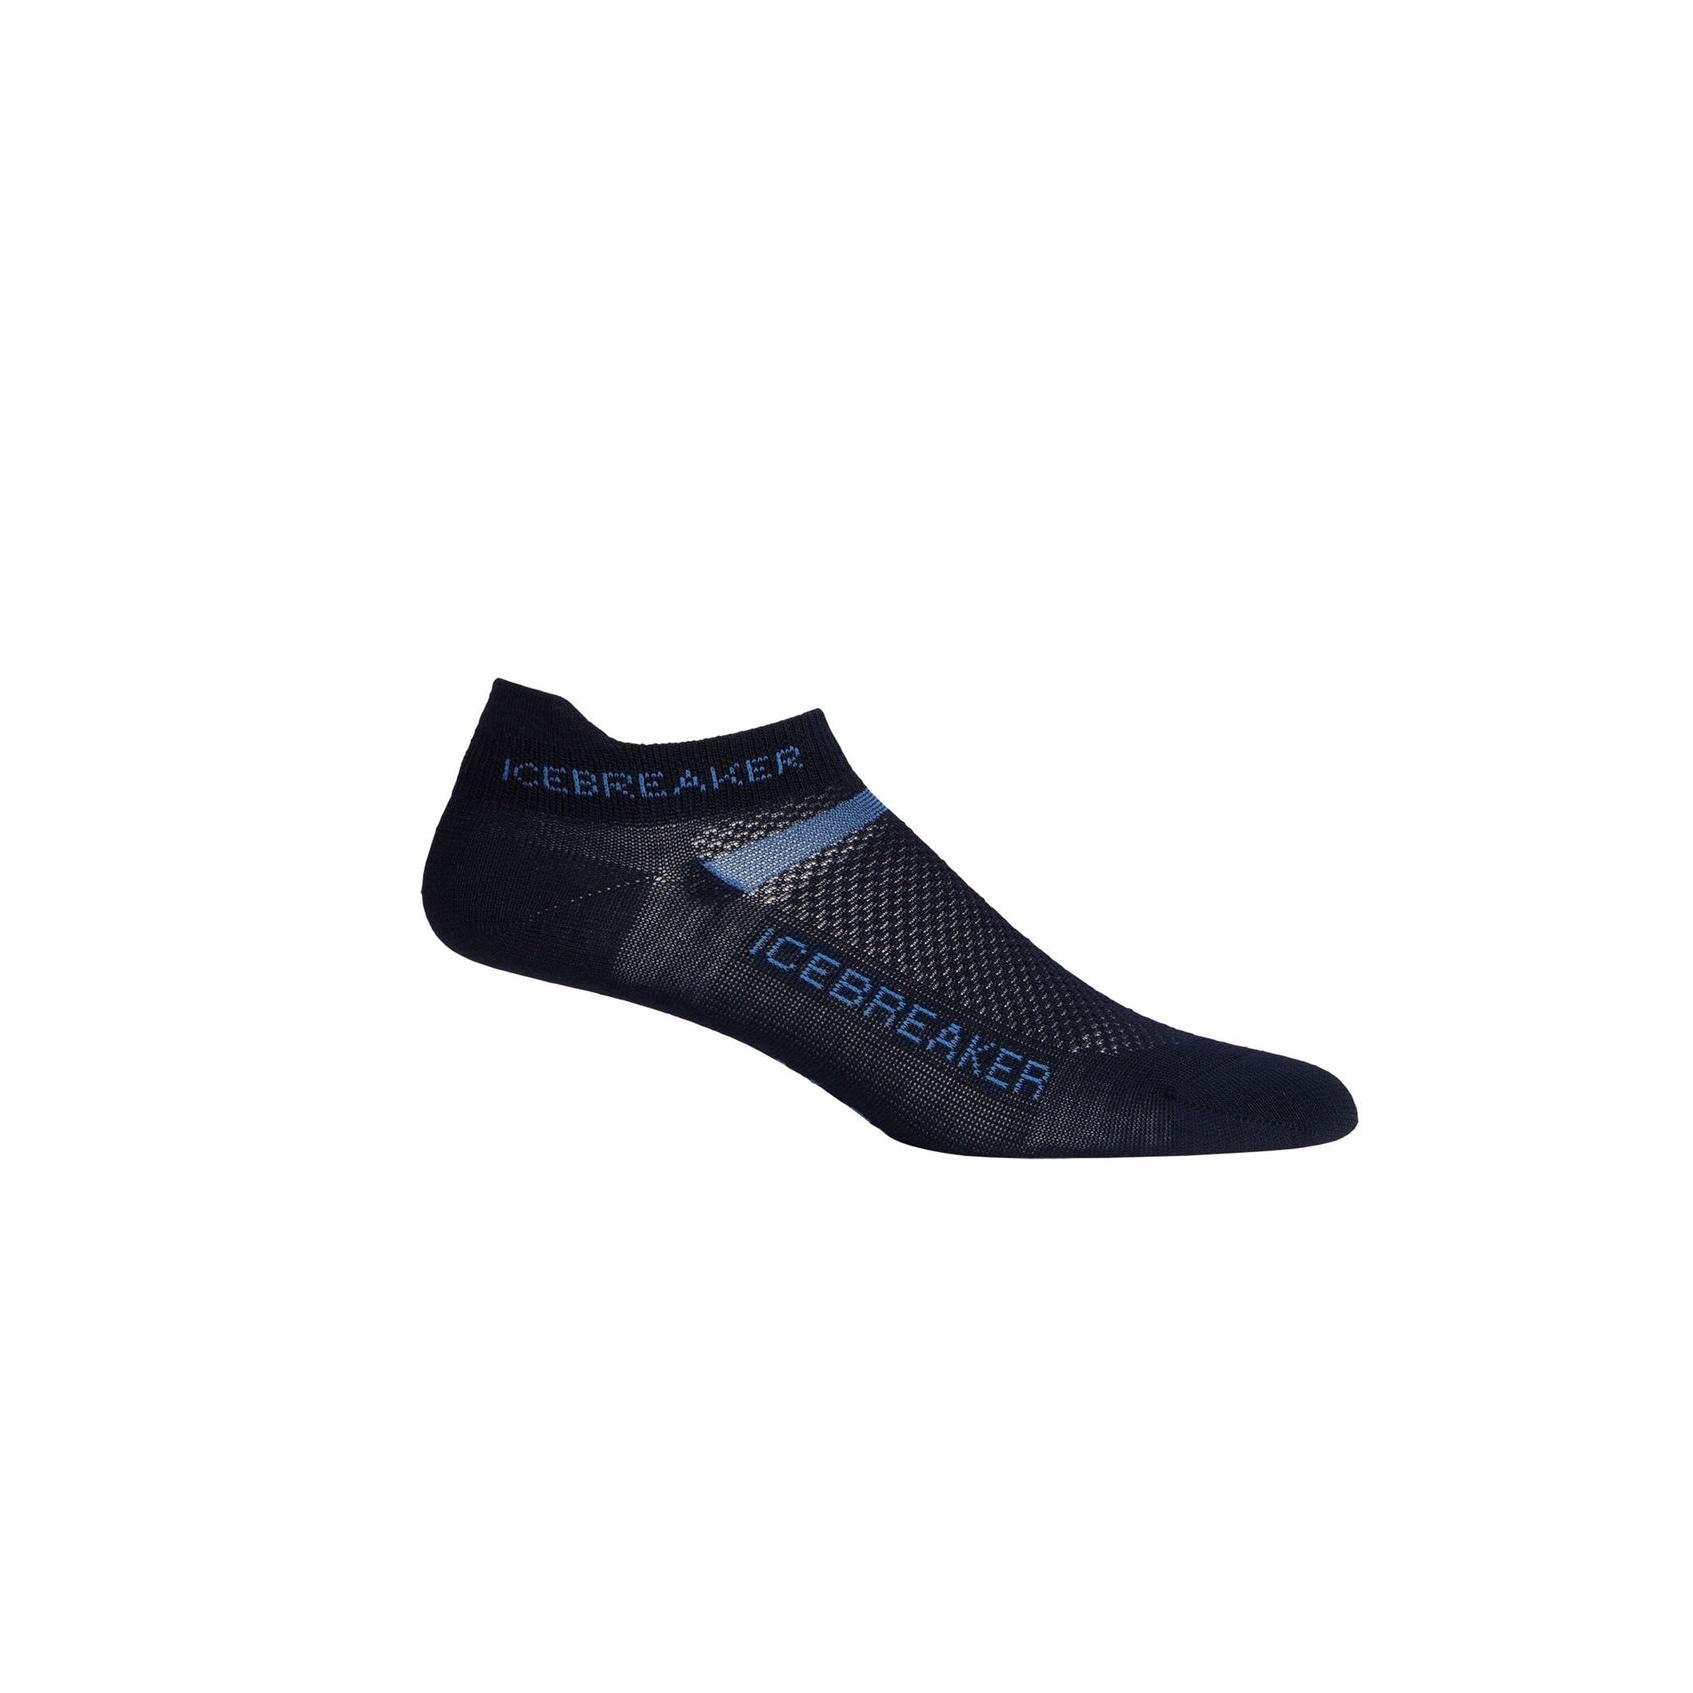 Multisport Ultra Light Micro Sock - Women's